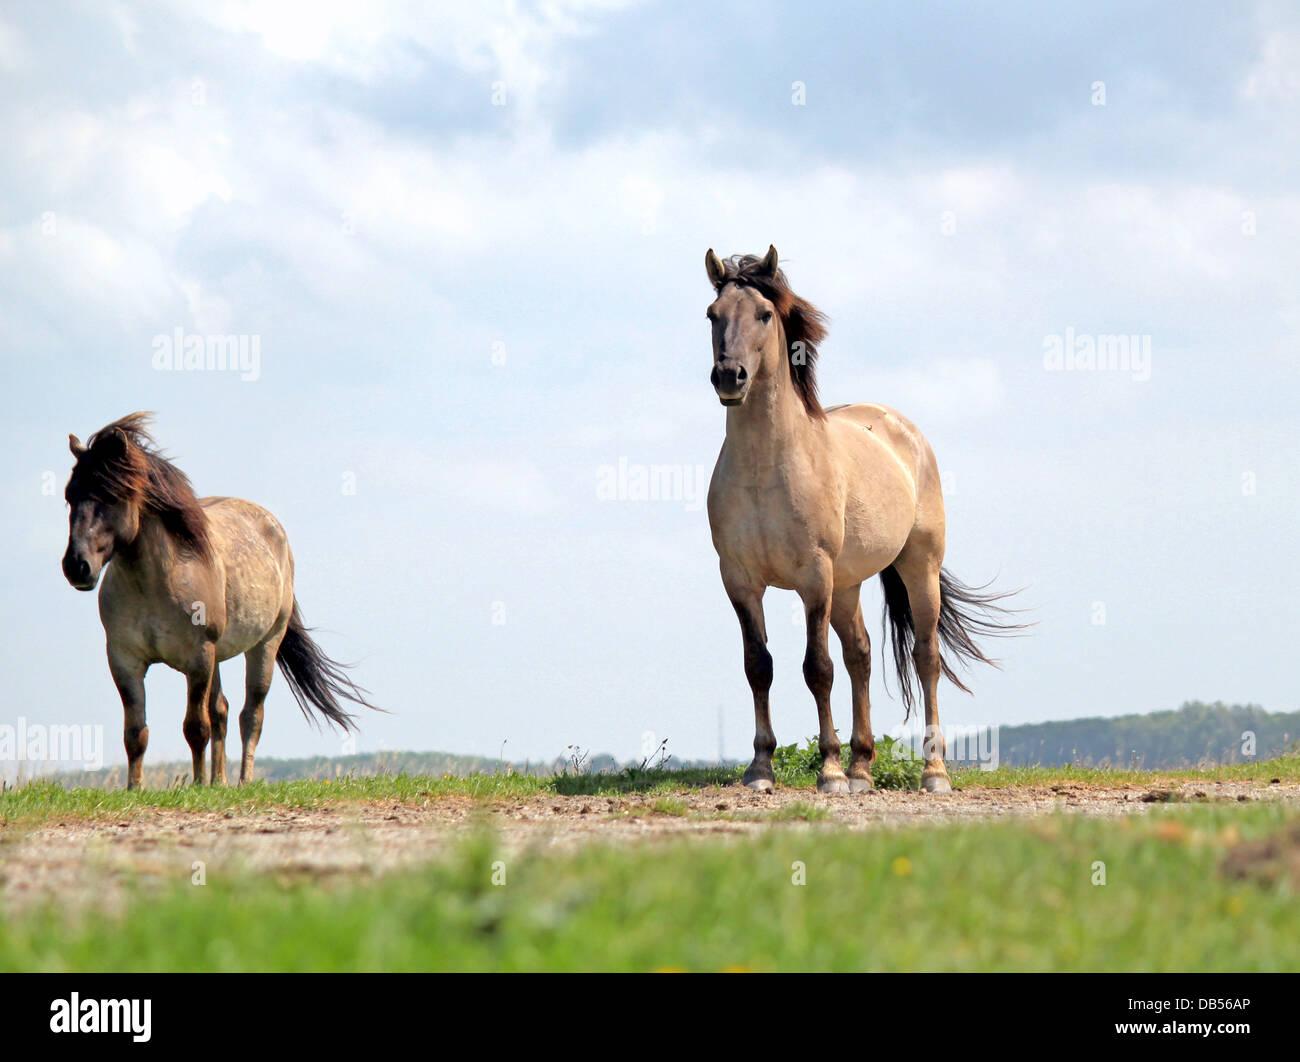 Polish primitive horses a.k.a. Konik Horses, low point of view - Stock Image